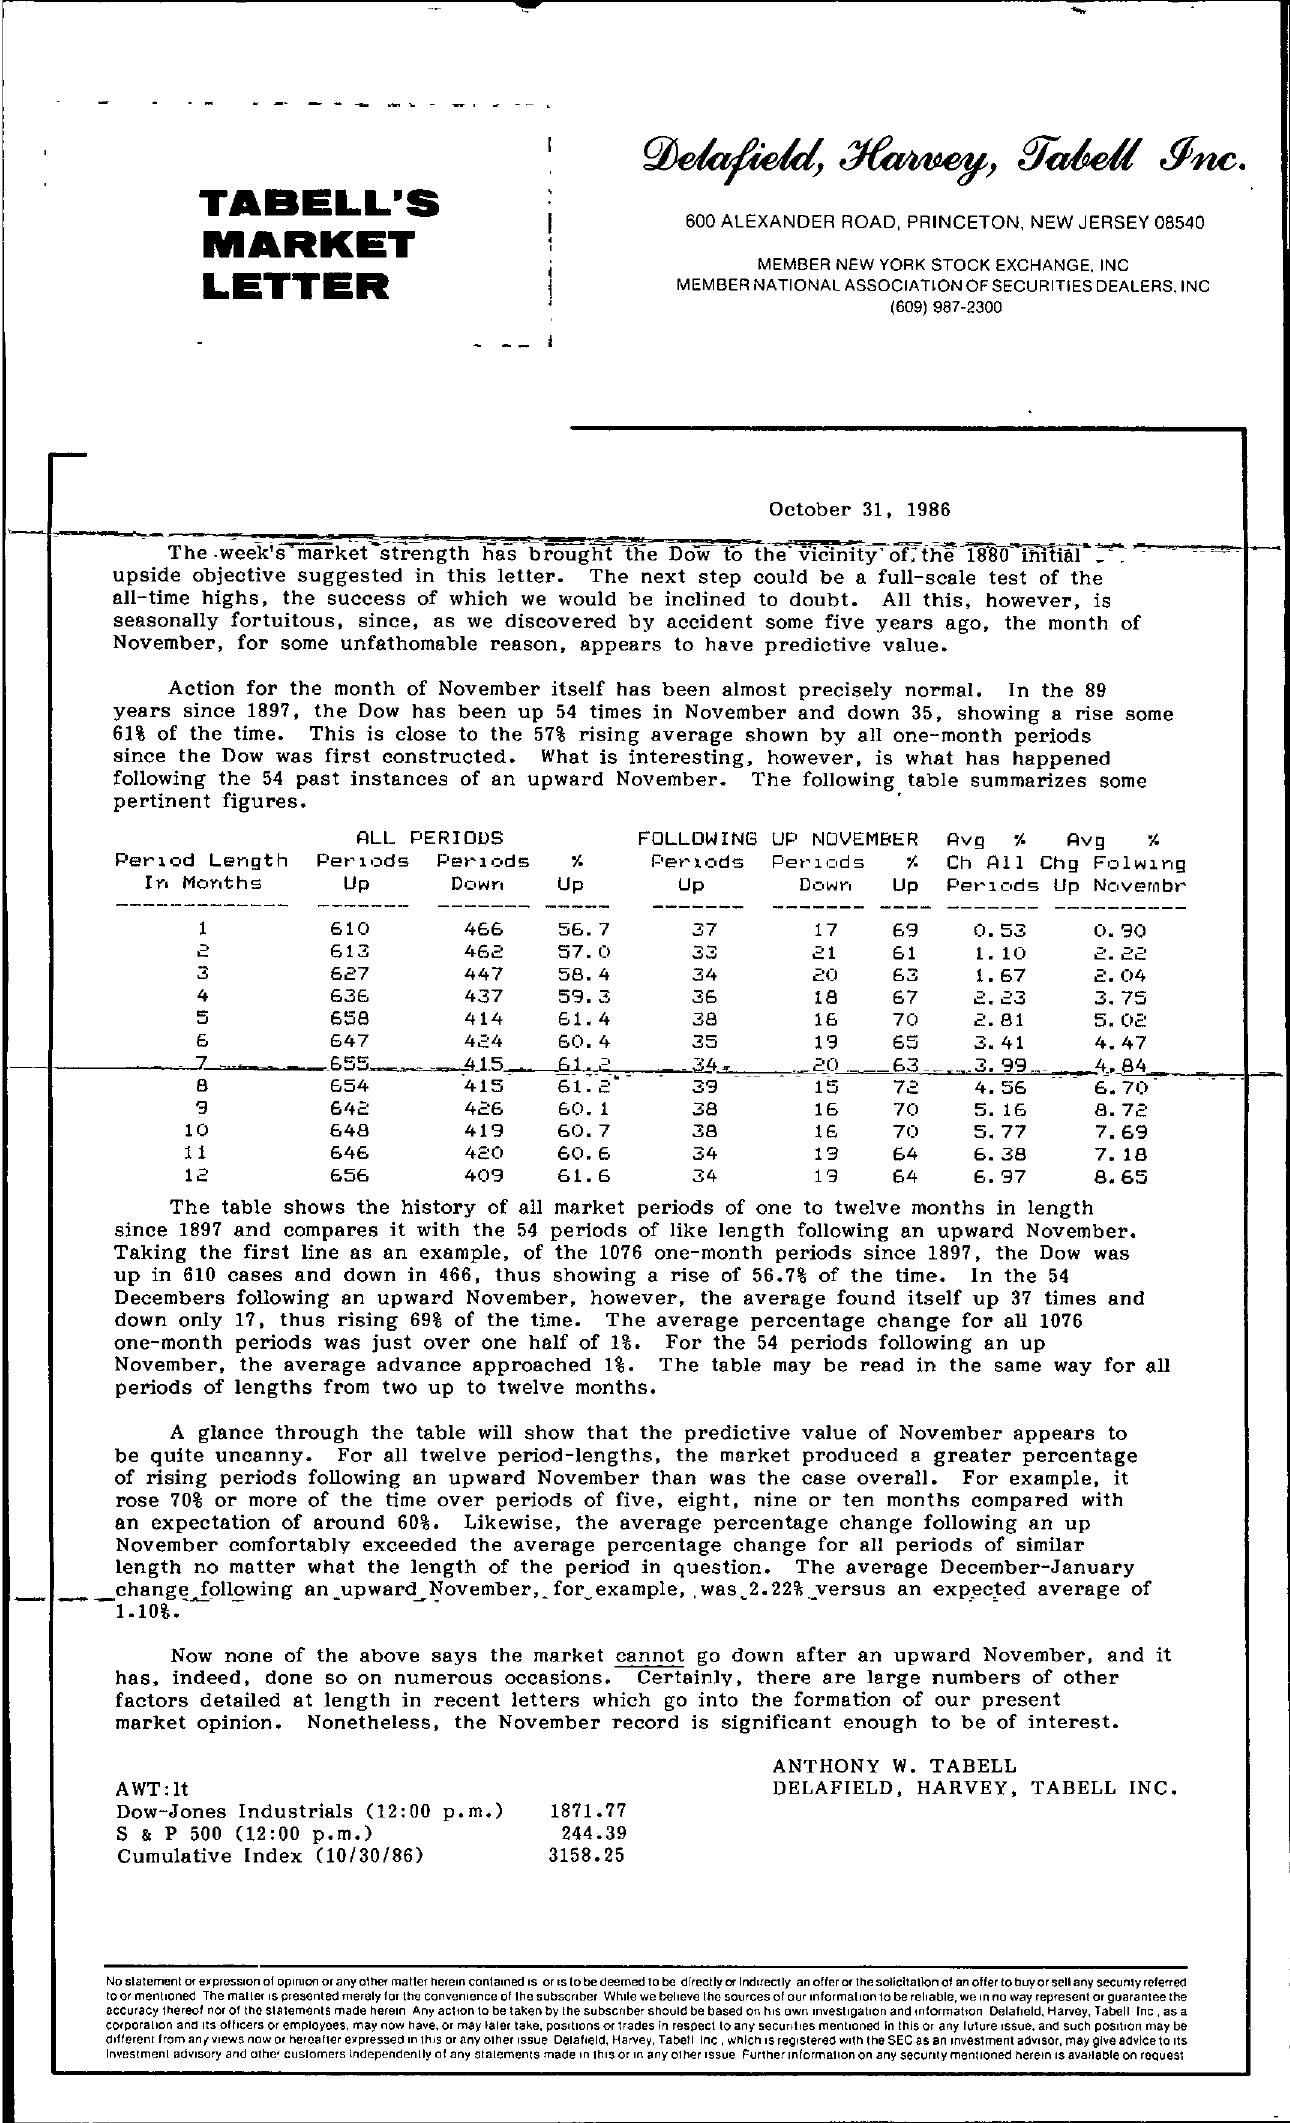 Tabell's Market Letter - October 31, 1986